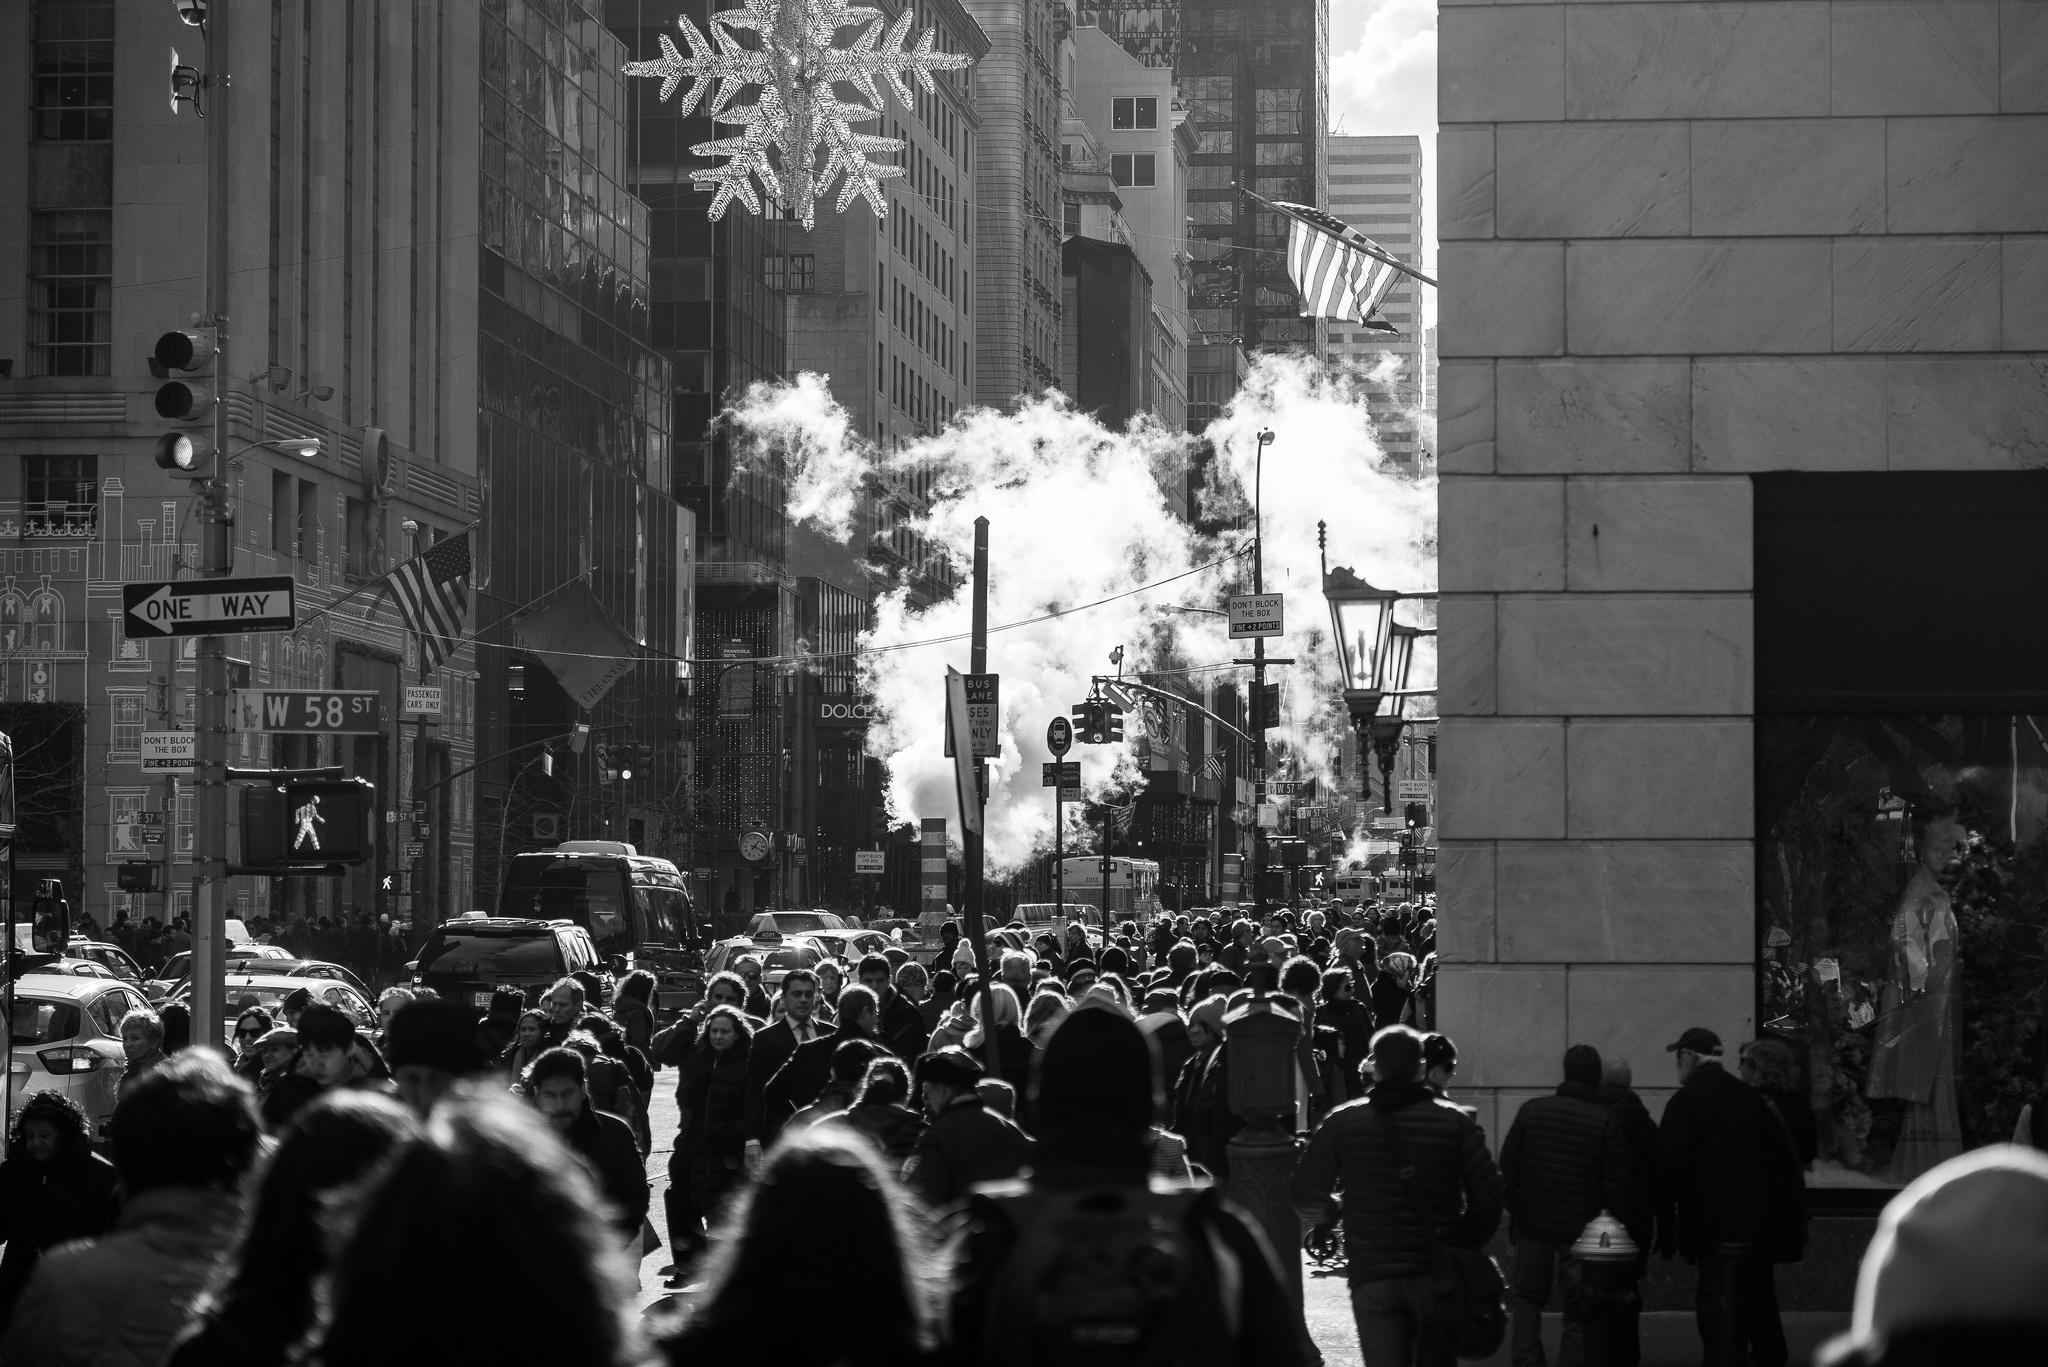 Frank Tasche-Black Friday @5th Ave